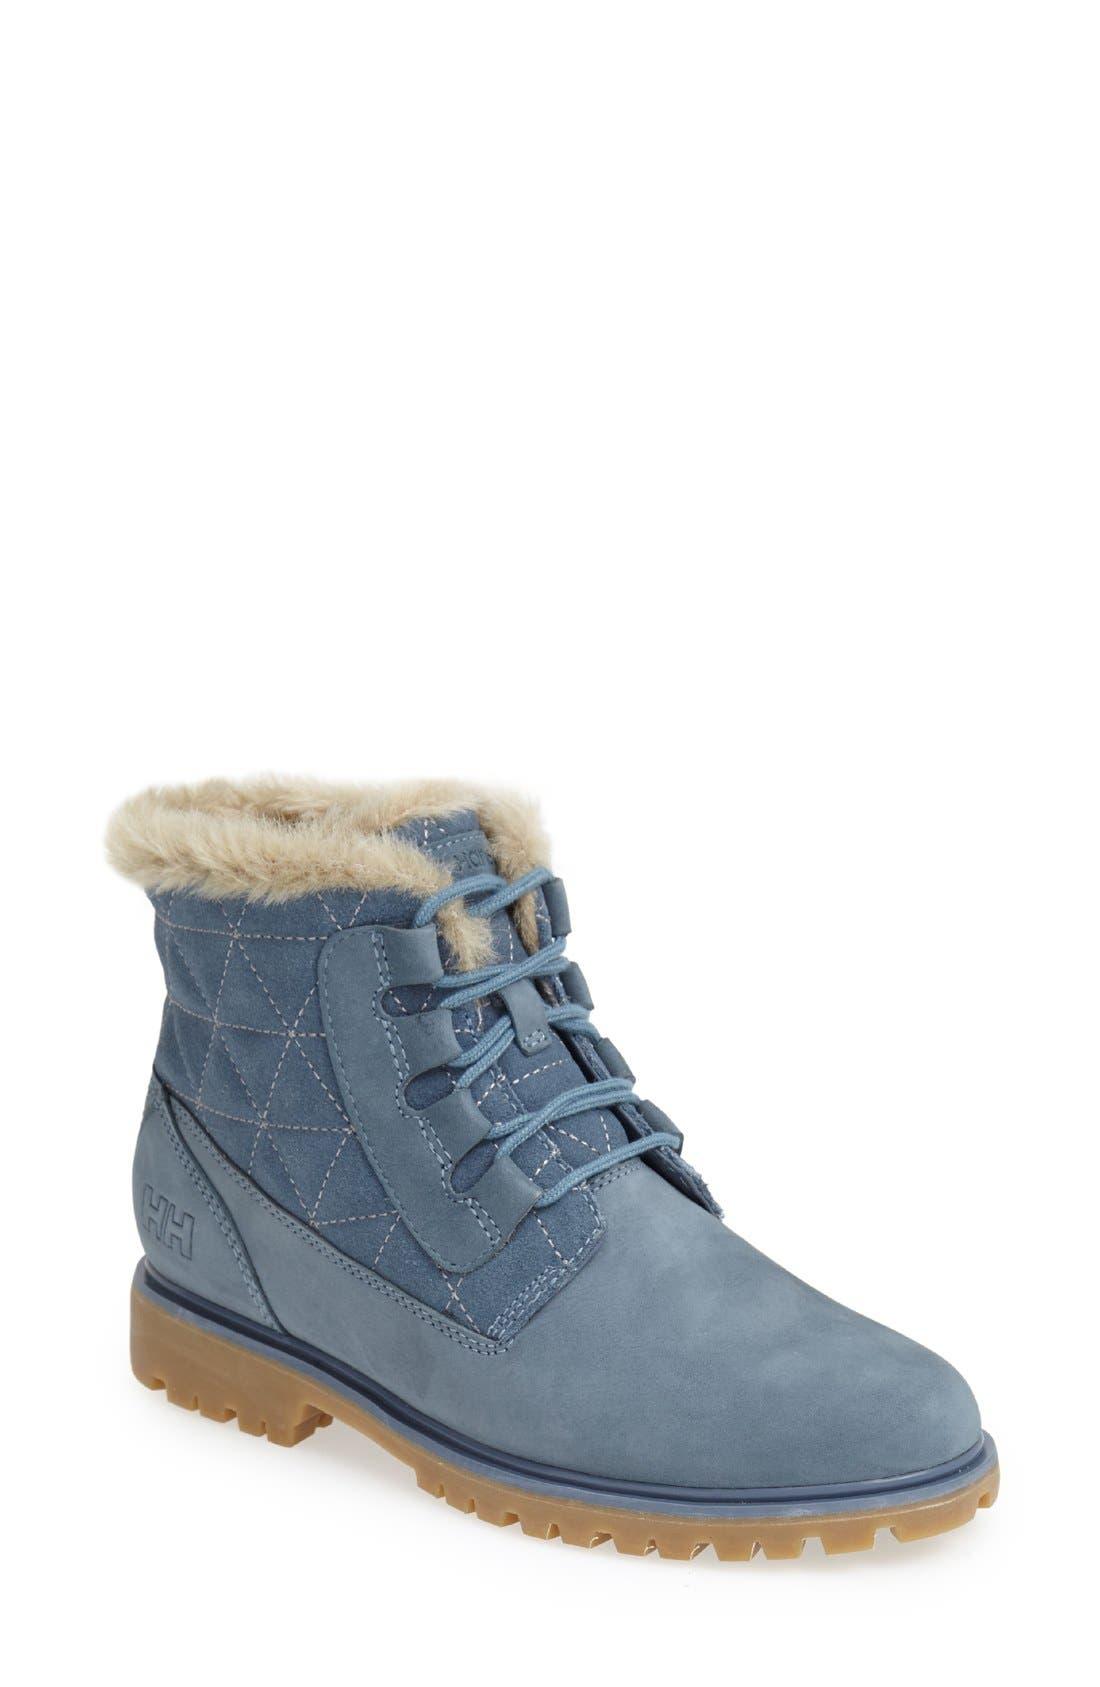 HELLY HANSEN 'Vega' Waterproof Leather Boot